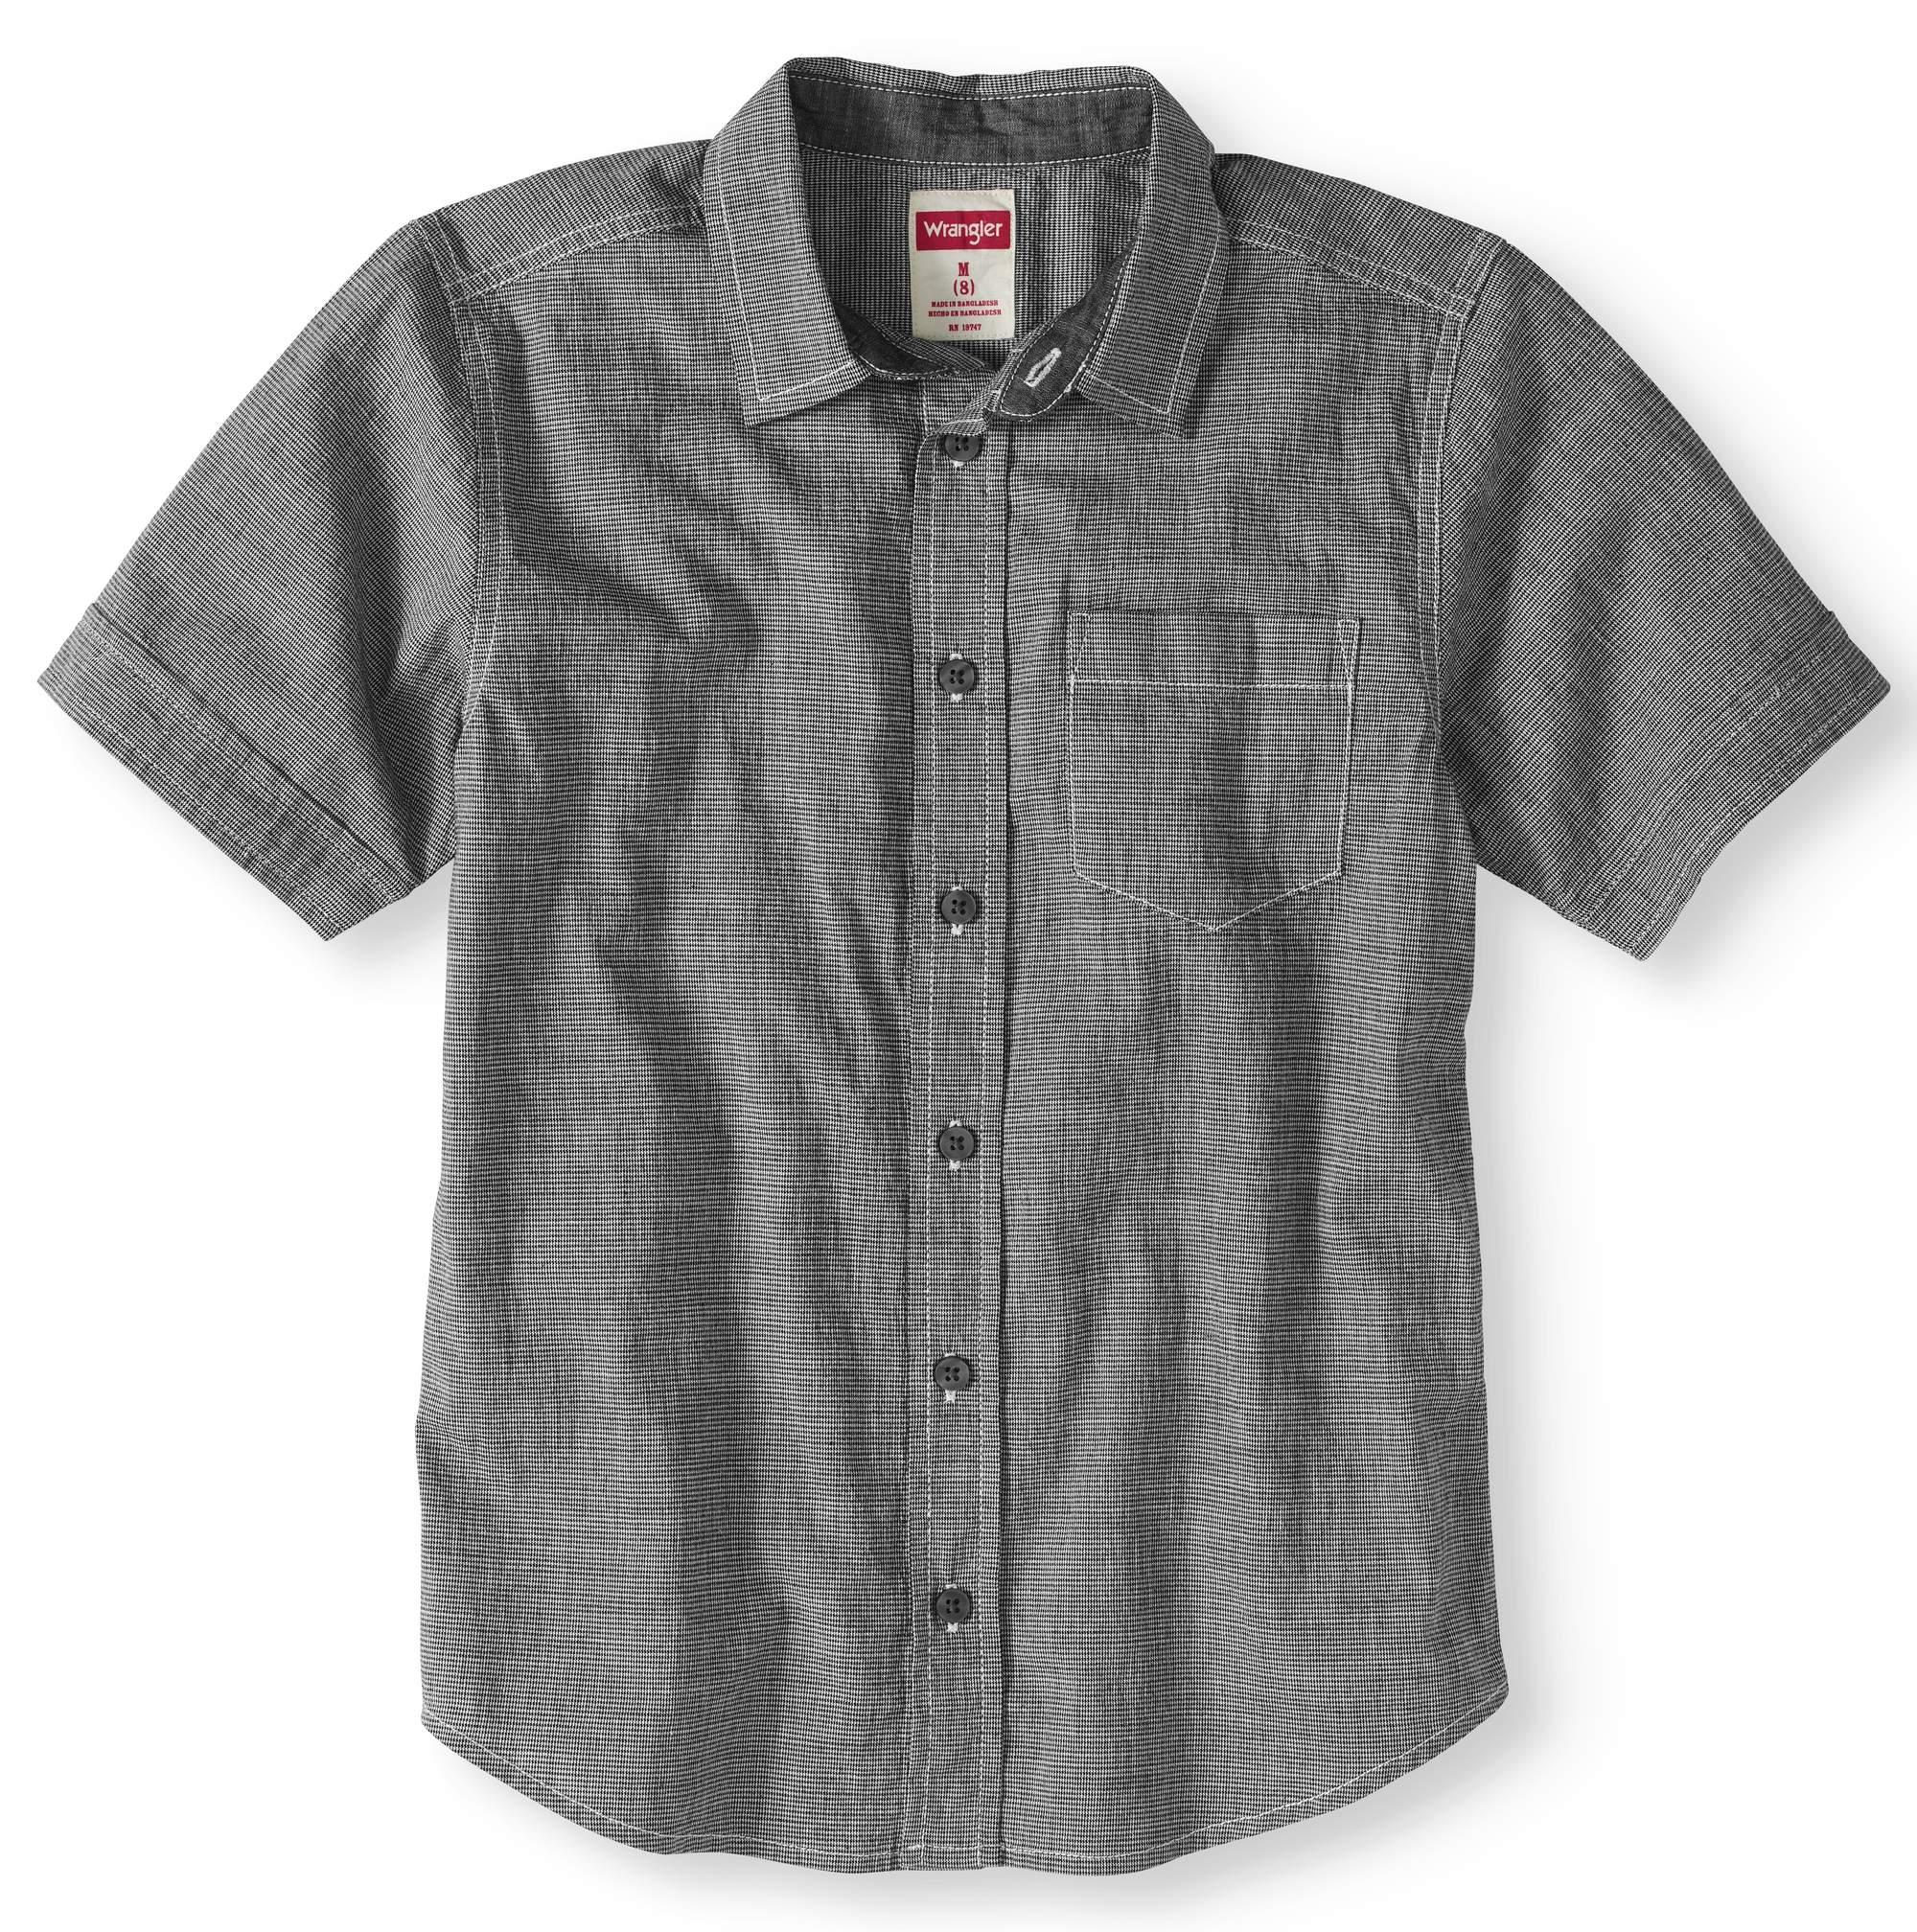 Boys Short Sleeve Plaid Button Up Top